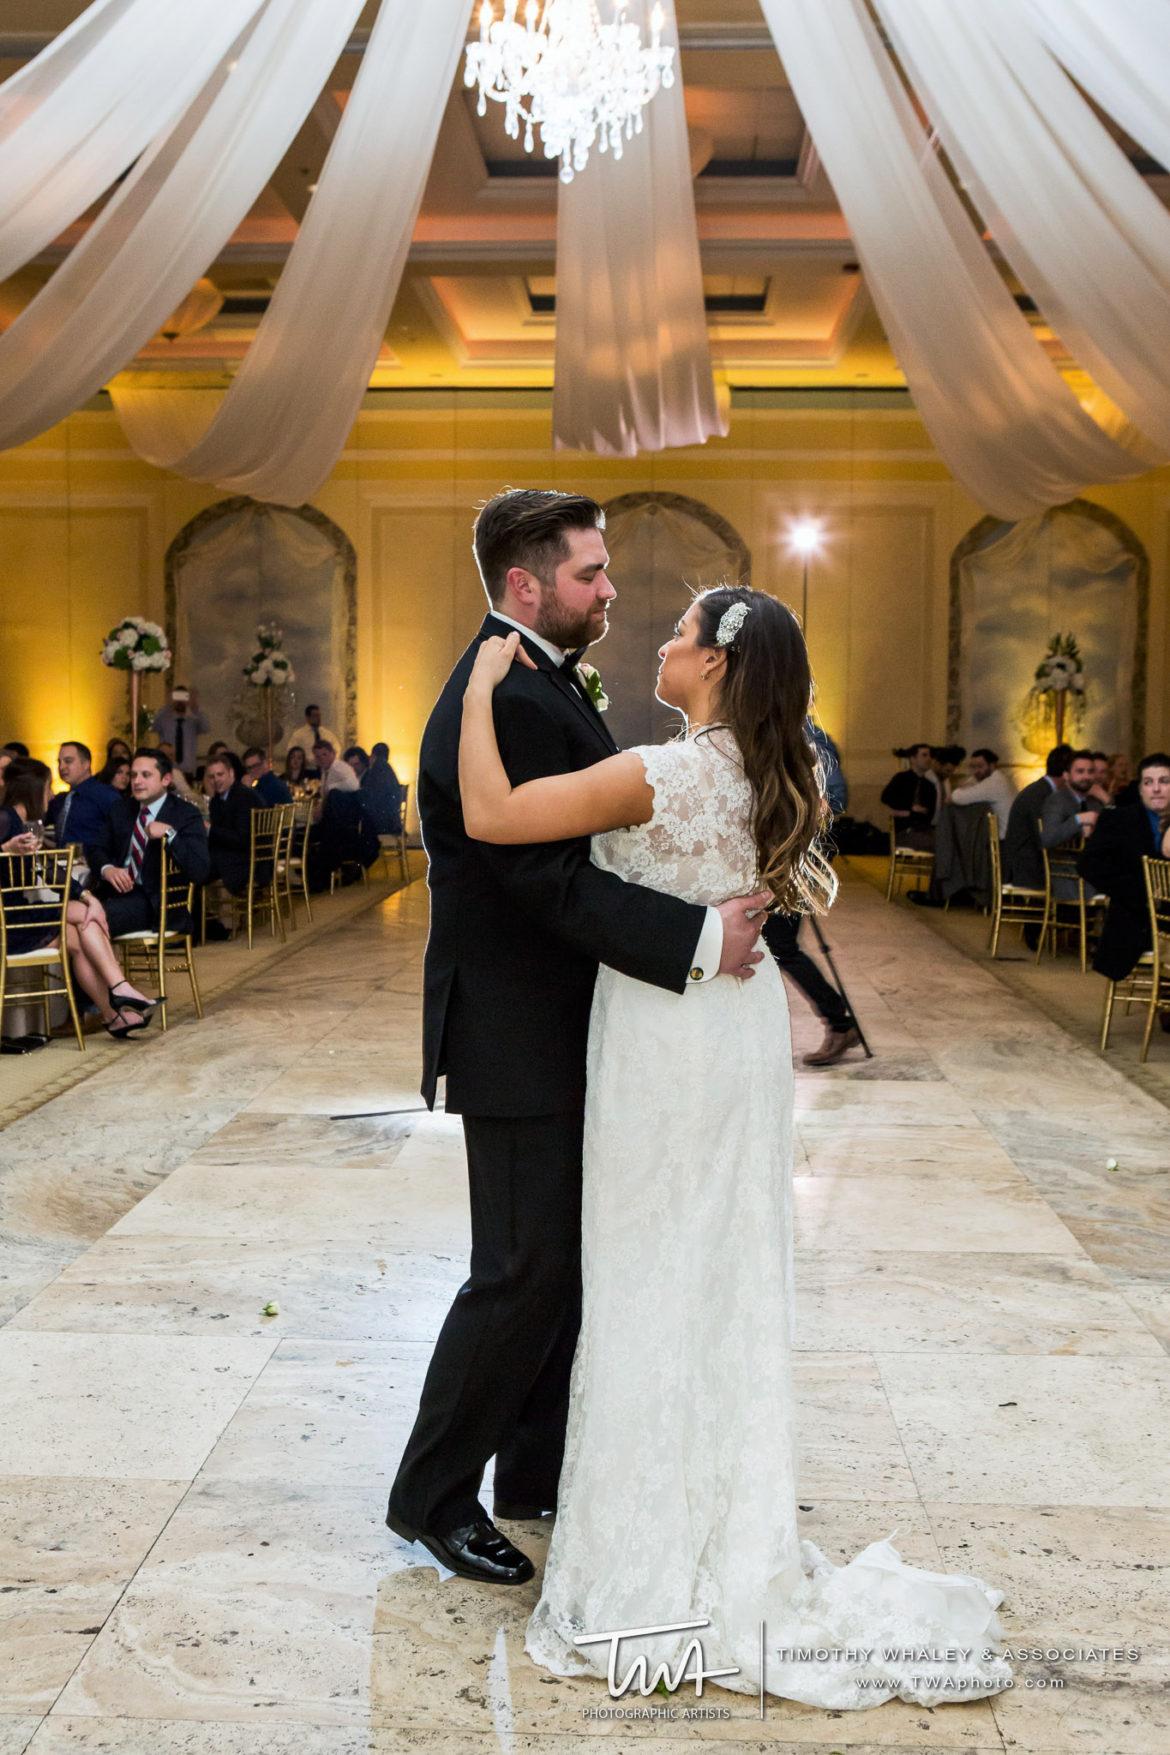 Elegant_Event_Lighting_Chicago_Venutis_Addison_Wedding_First_Dance_Ceiling_Drapes